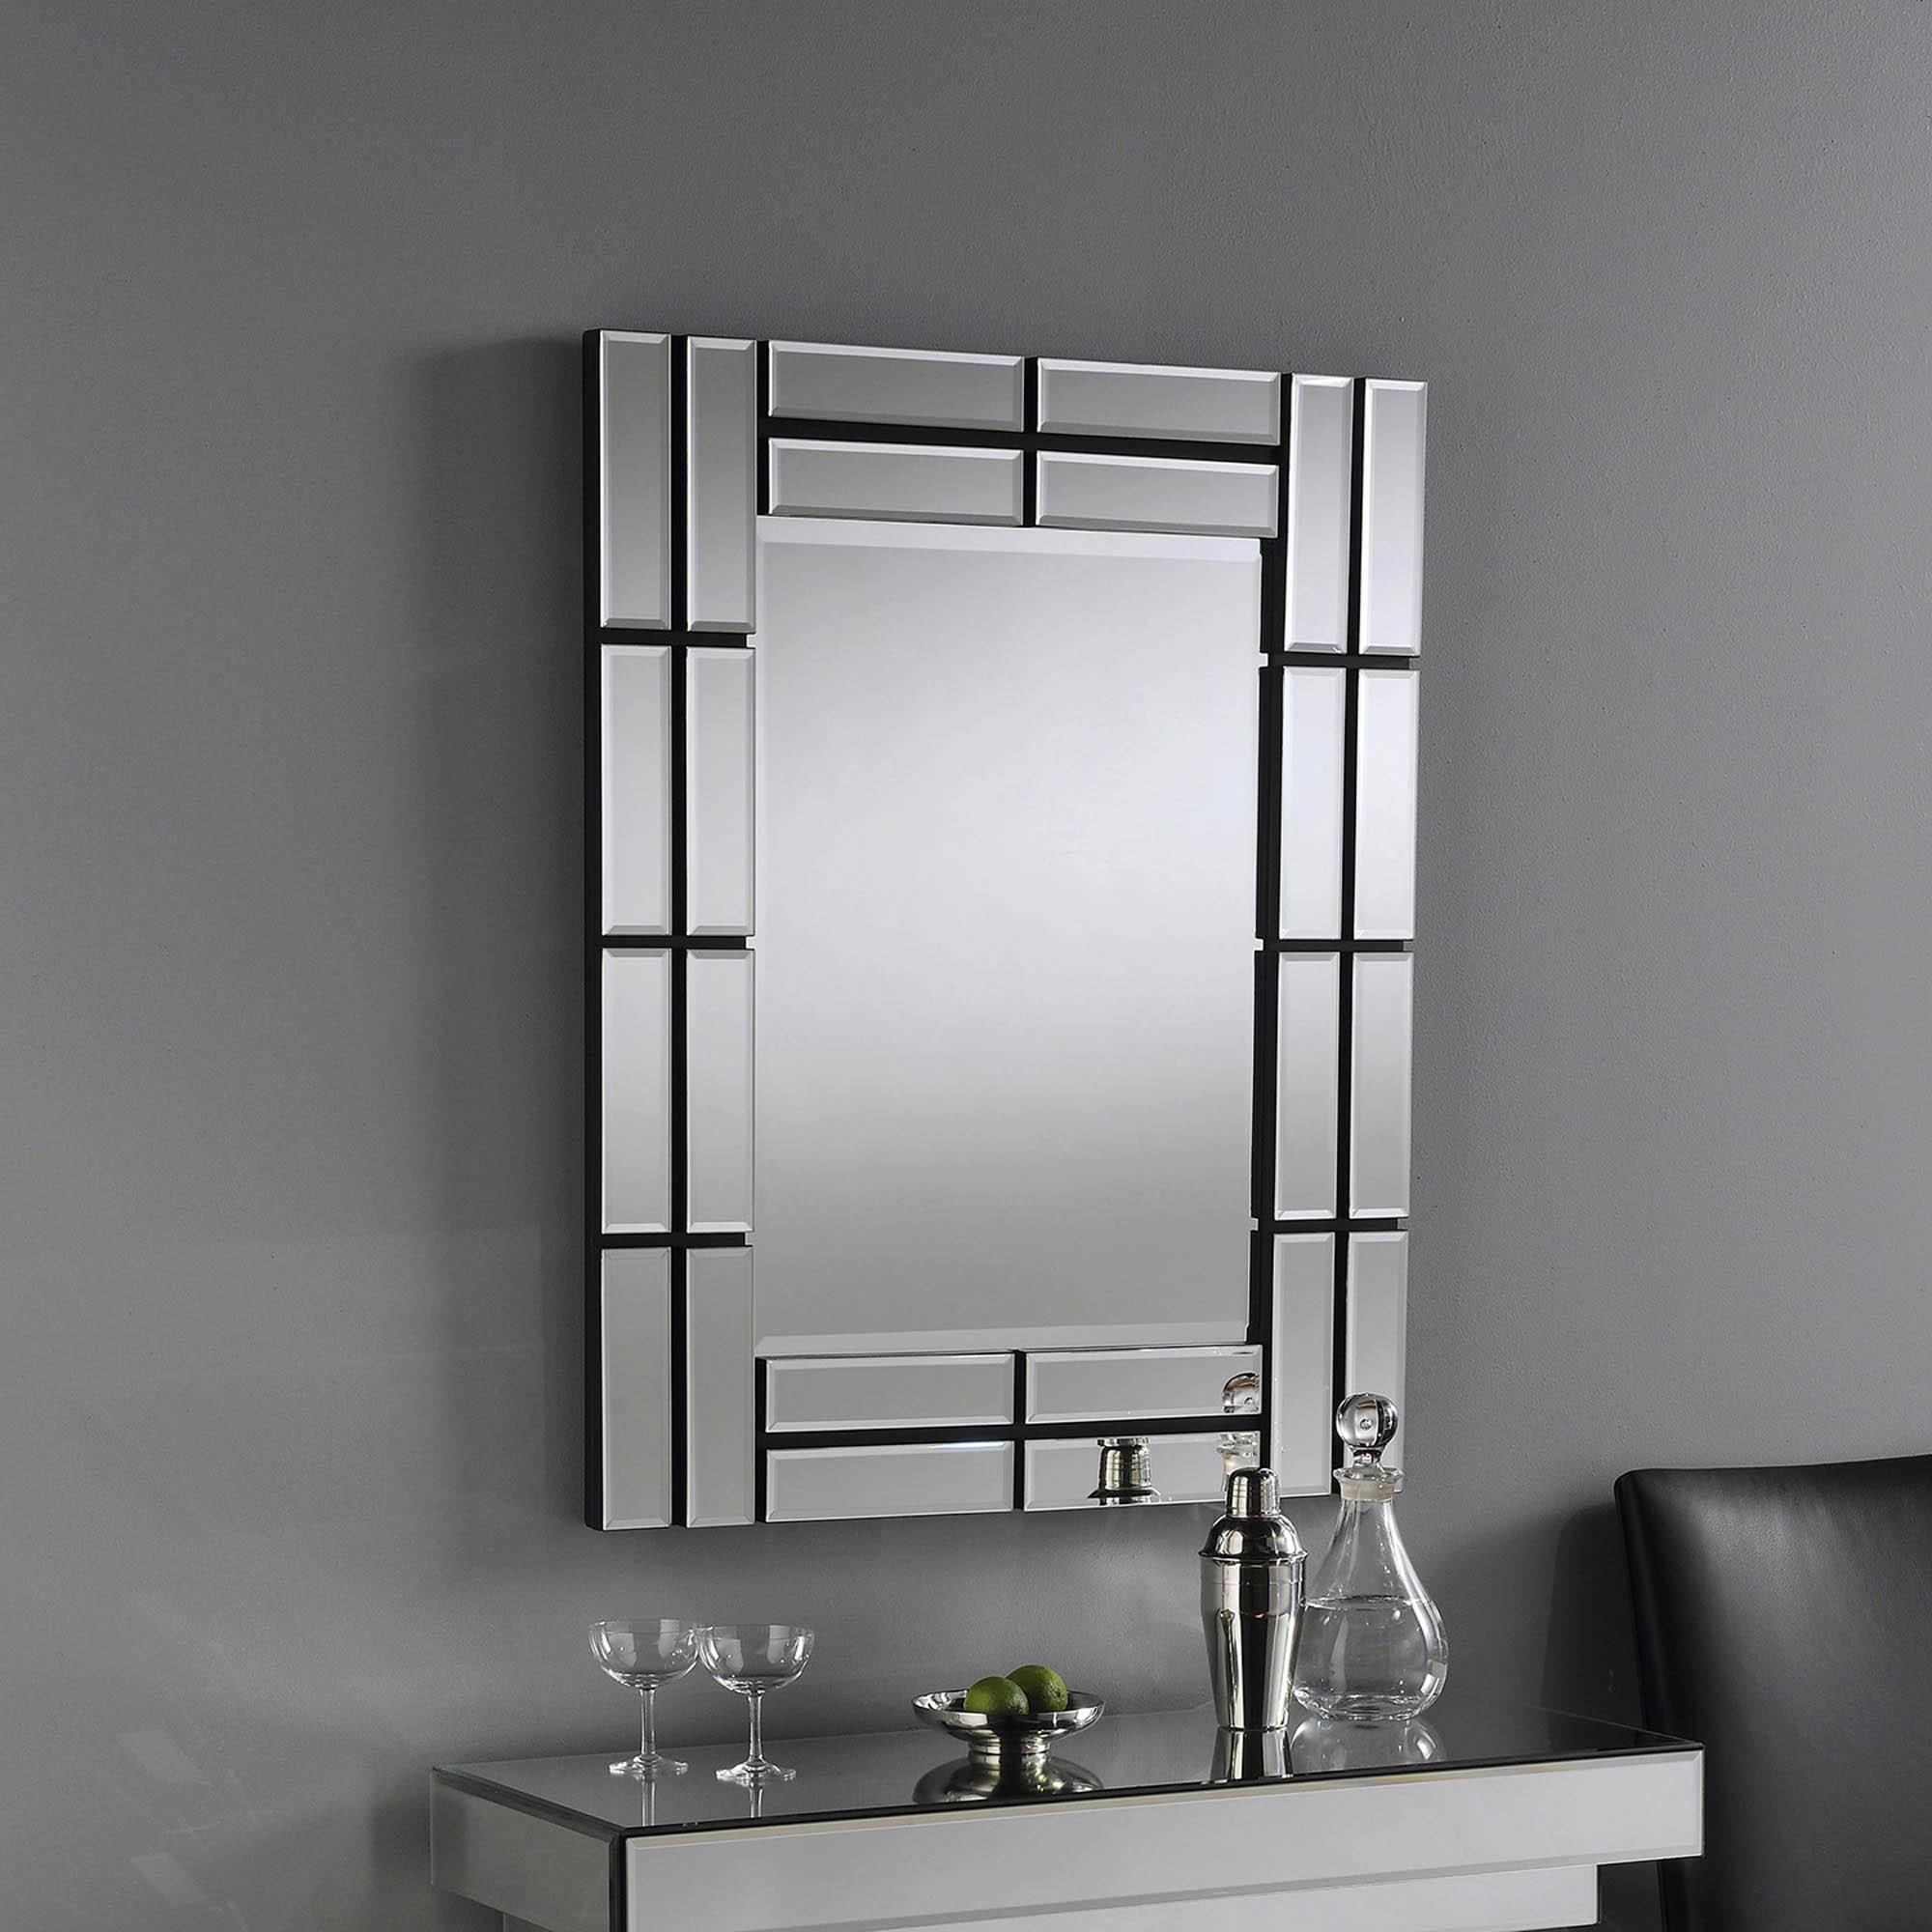 Art Black Wall Mirror Mirror Design Wall Mirror Frames Black Wall Mirror [ 2000 x 2000 Pixel ]